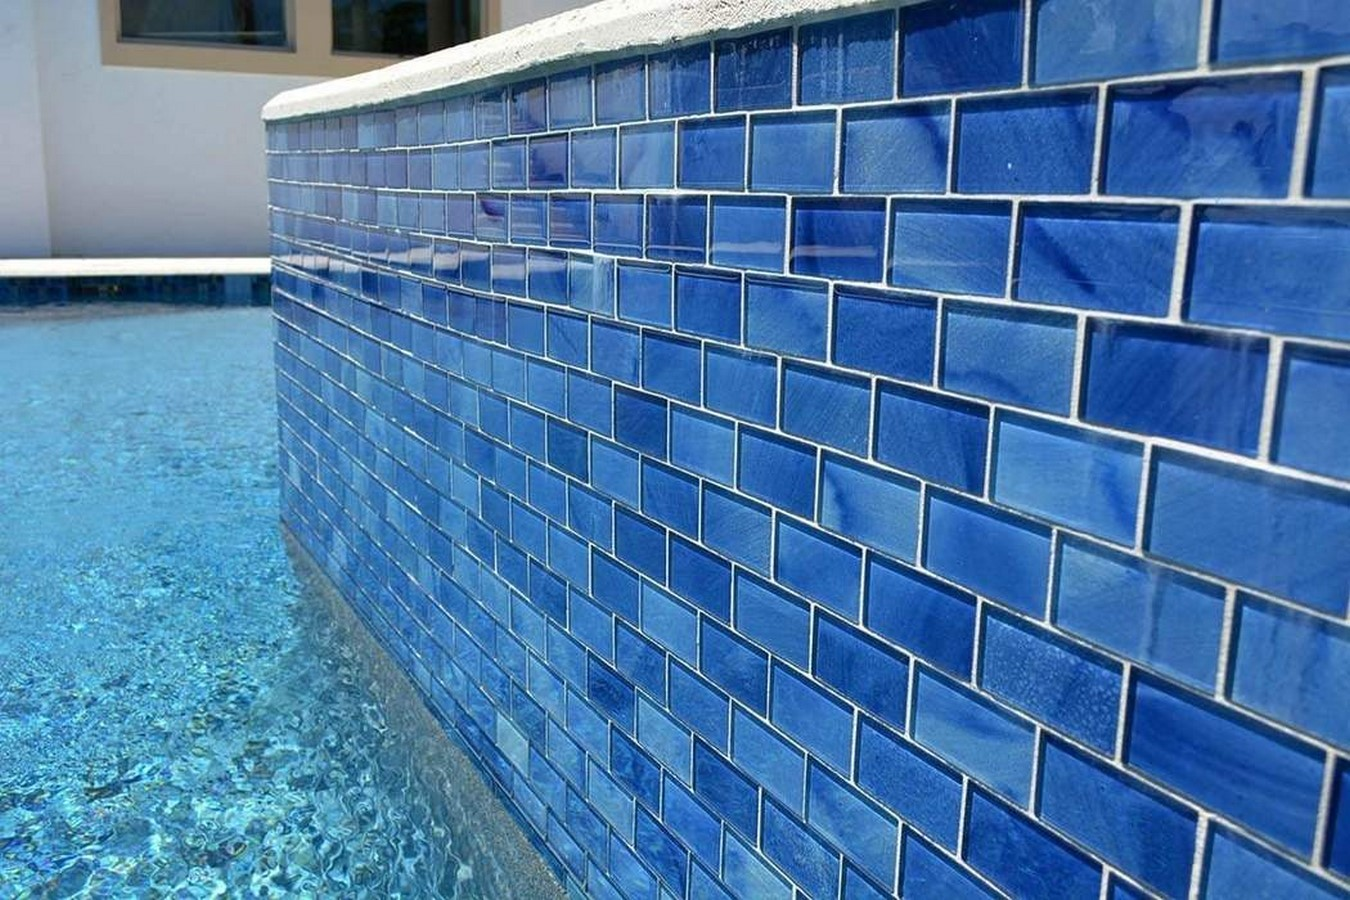 25 flooring patterns for Swimming Pools - Sheet22